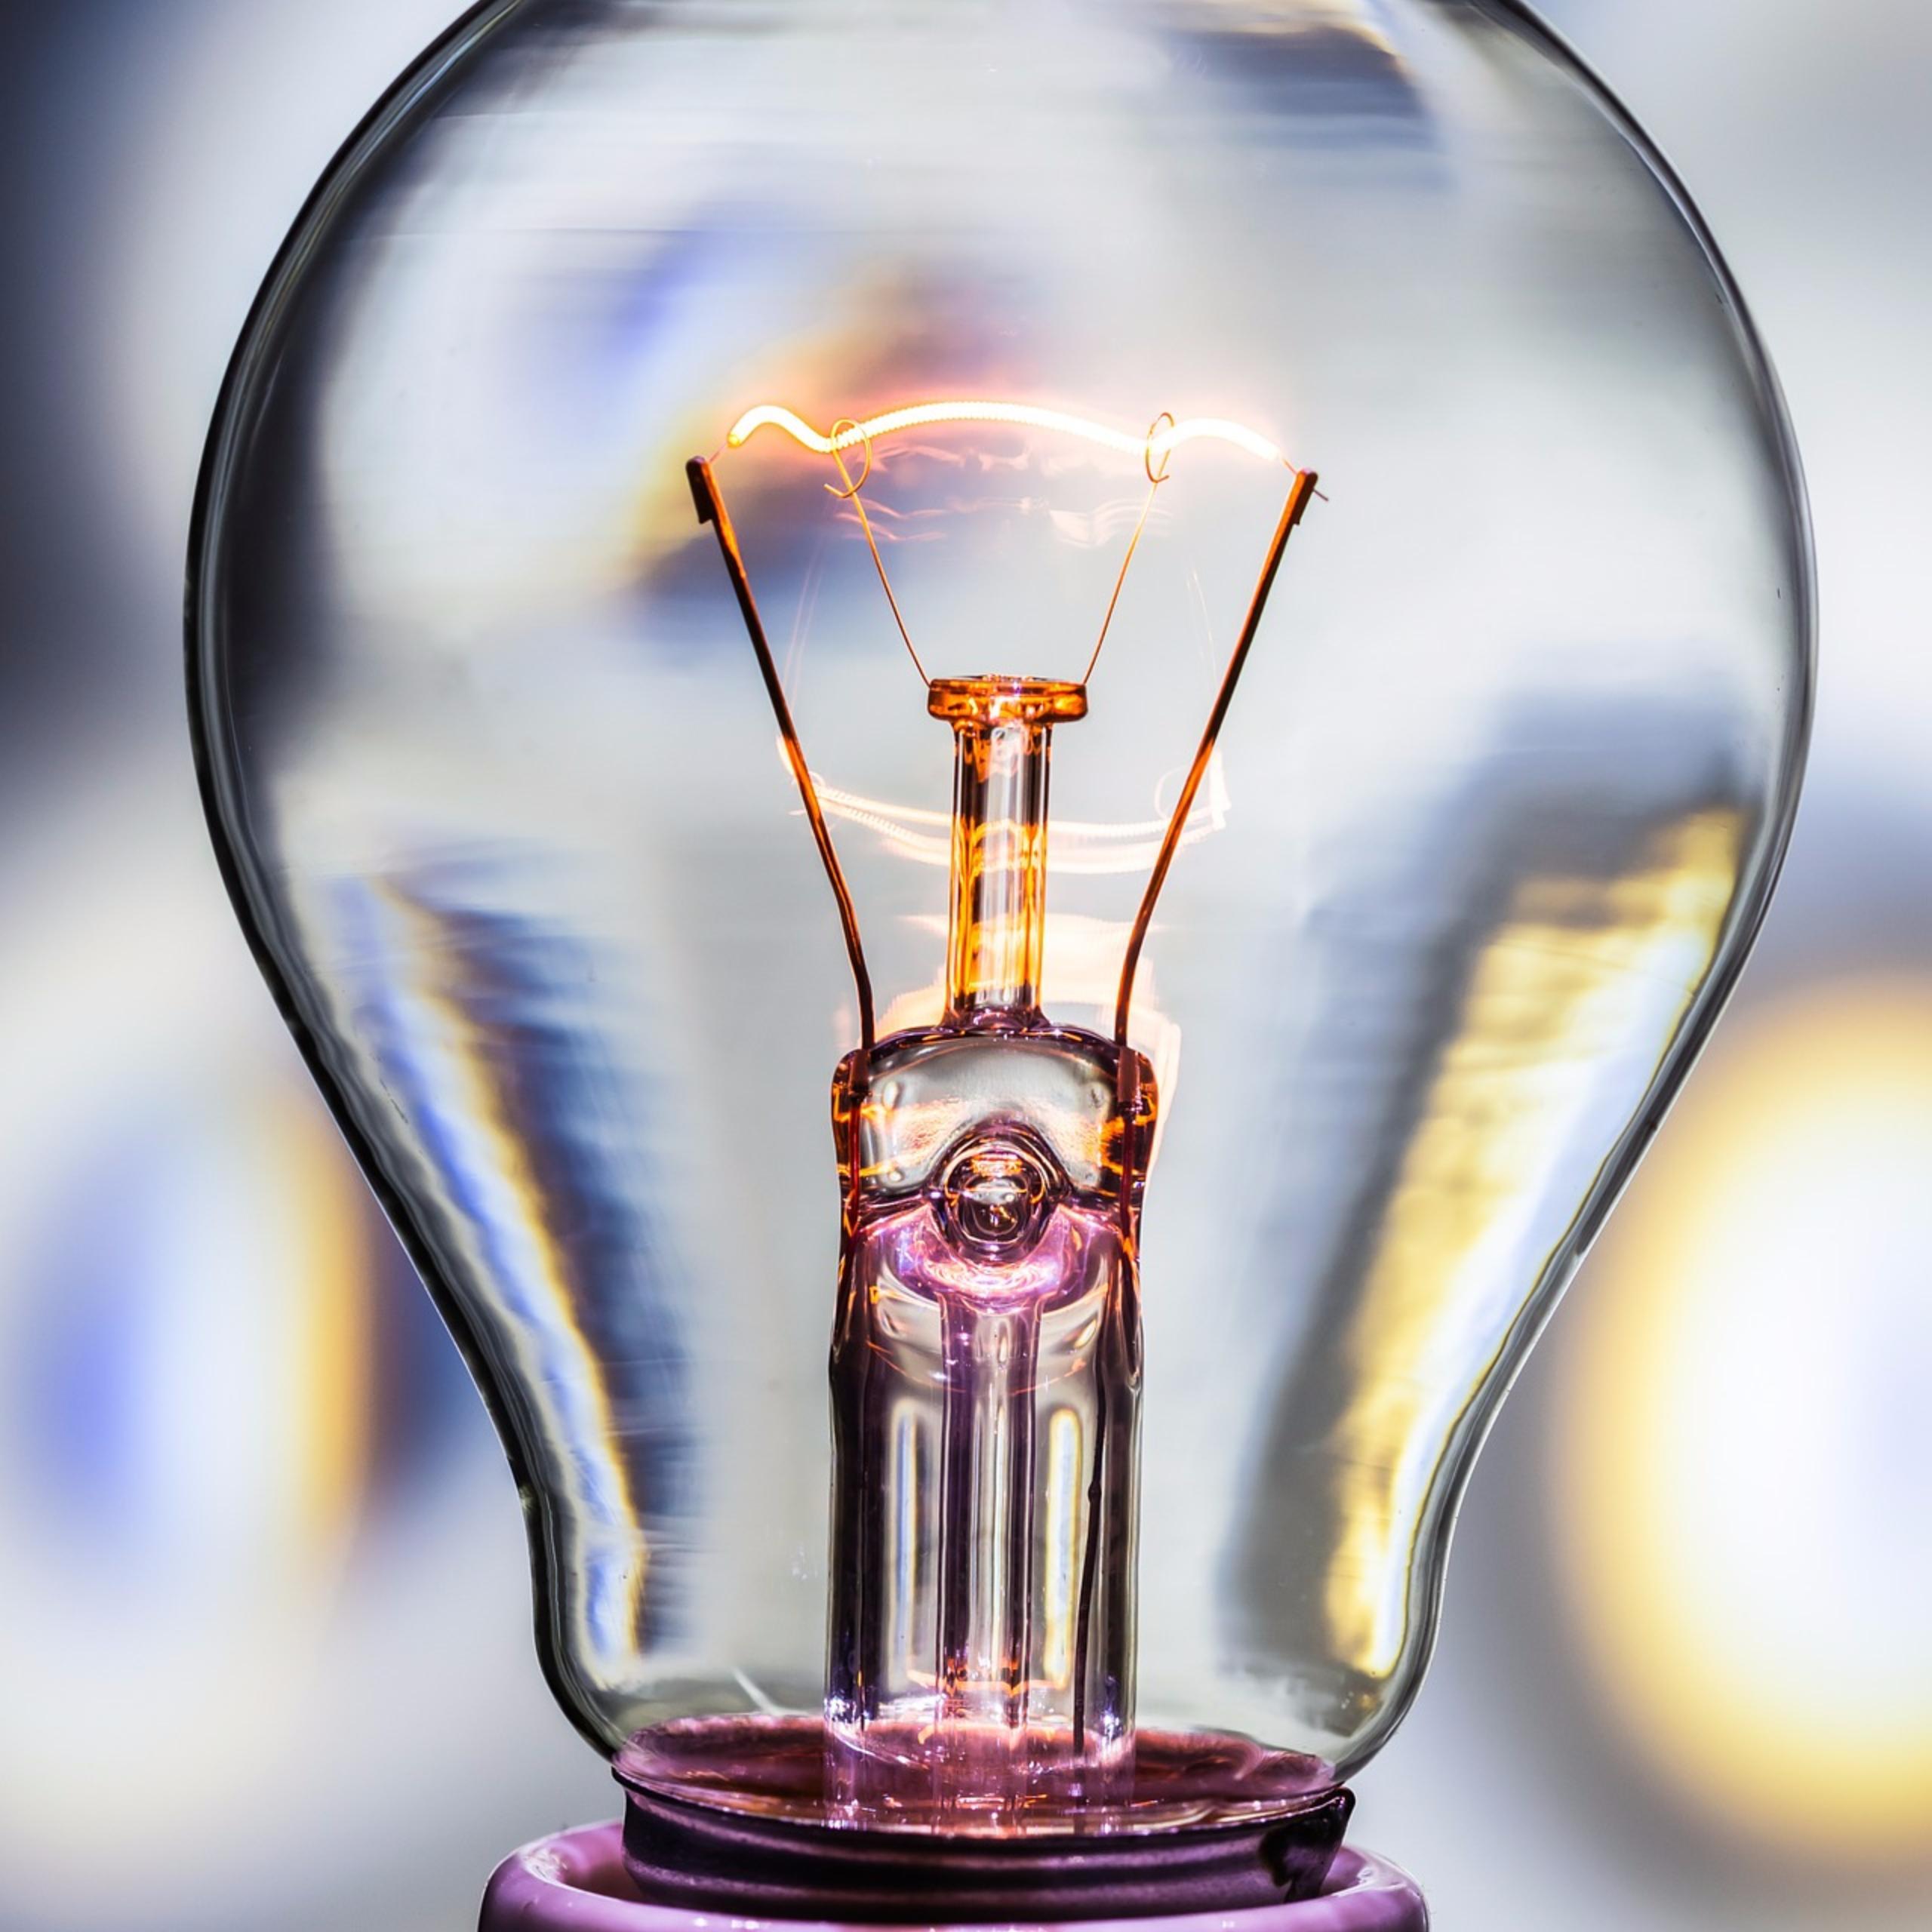 Entrepreneurship Electric Light Bulbs and Other Reasons to Celebrate Entrepreneurship